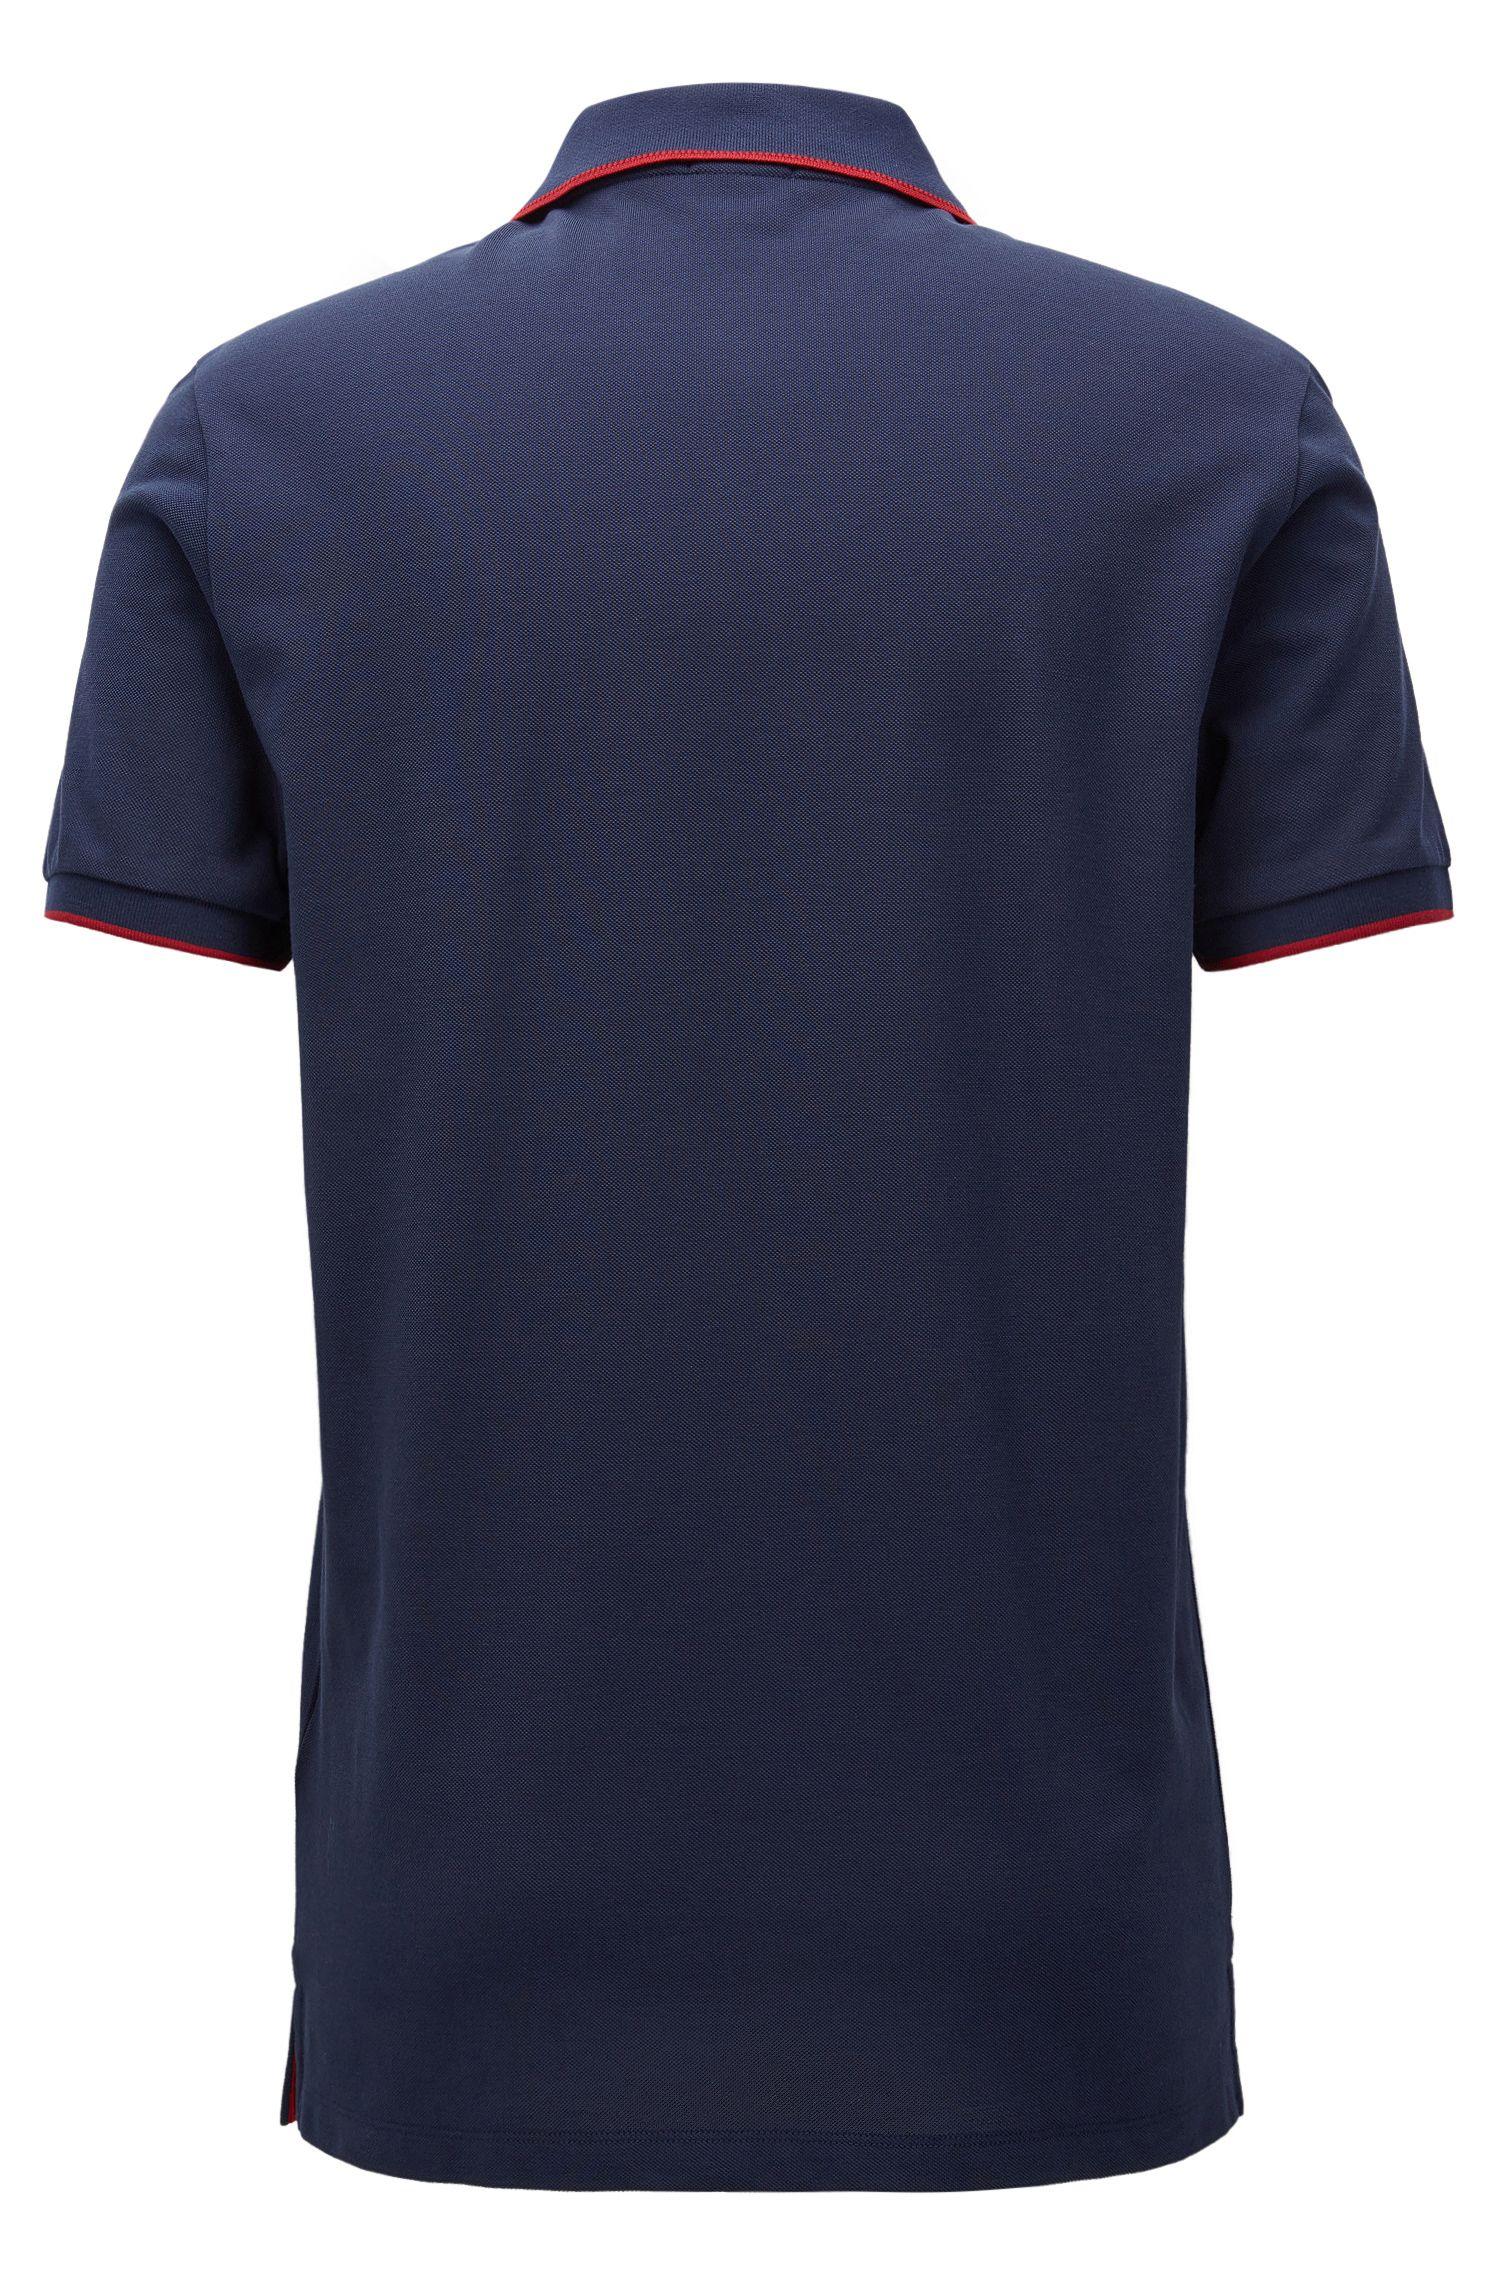 Piqué Cotton Polo Shirt, Regular Fit | Parlay